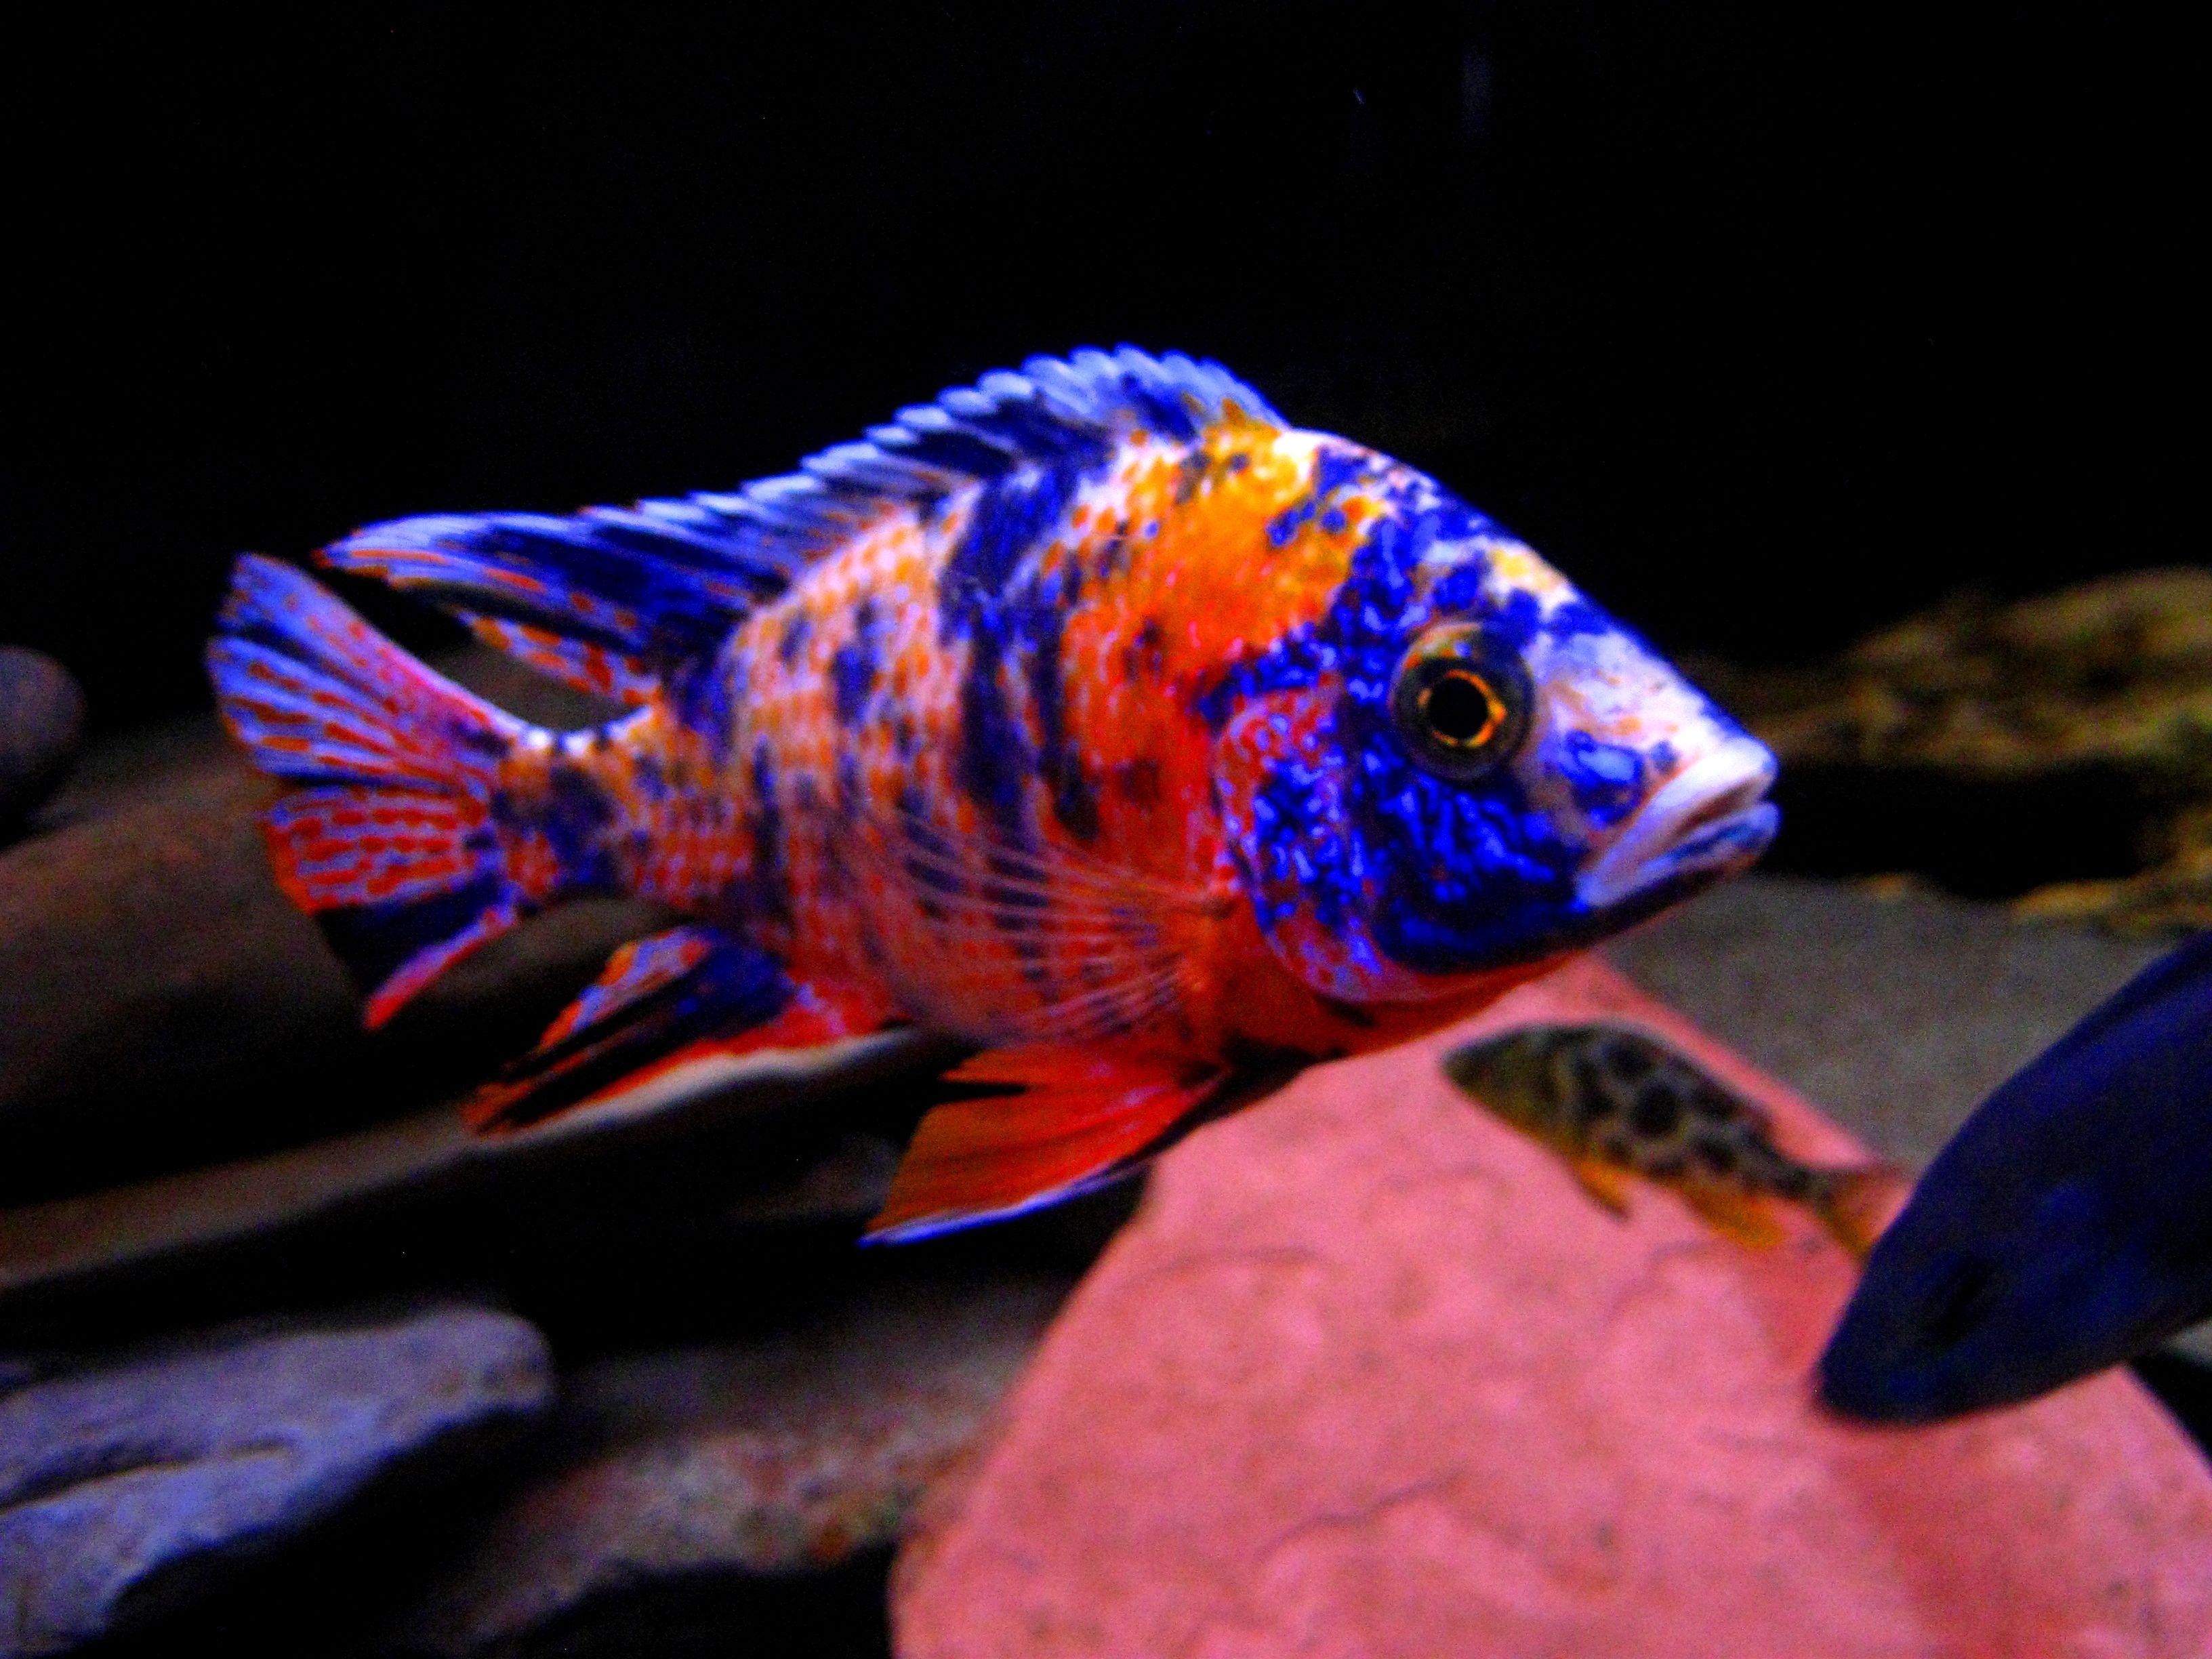 Aulonocara Sp Hybrid Ob Peacock Cichlid Image Result For Ob Peacock Cichlids African Cichlid Aquarium African Cichlids Cichlids